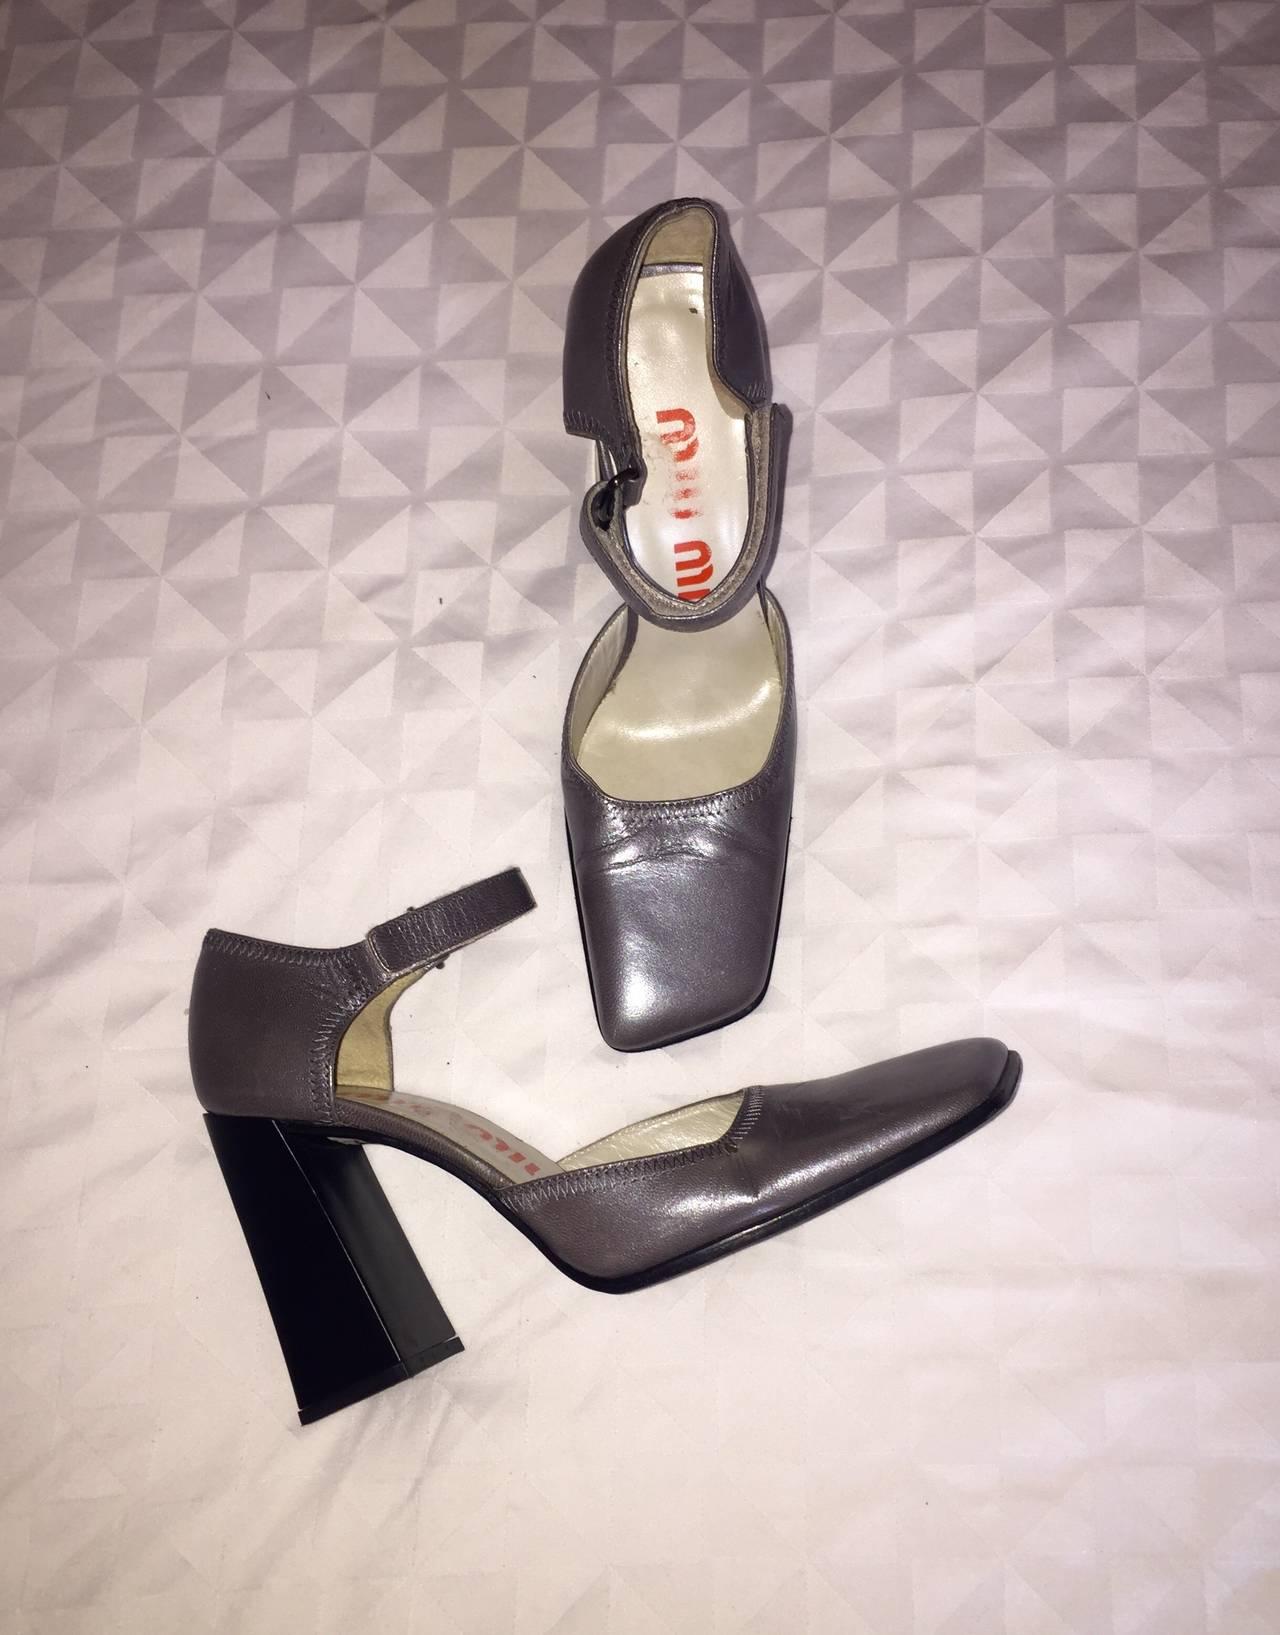 Rare 1990s Vintage Miu Miu ' Architectural ' Gunmetal Block Heels / Shoes 36.5 9